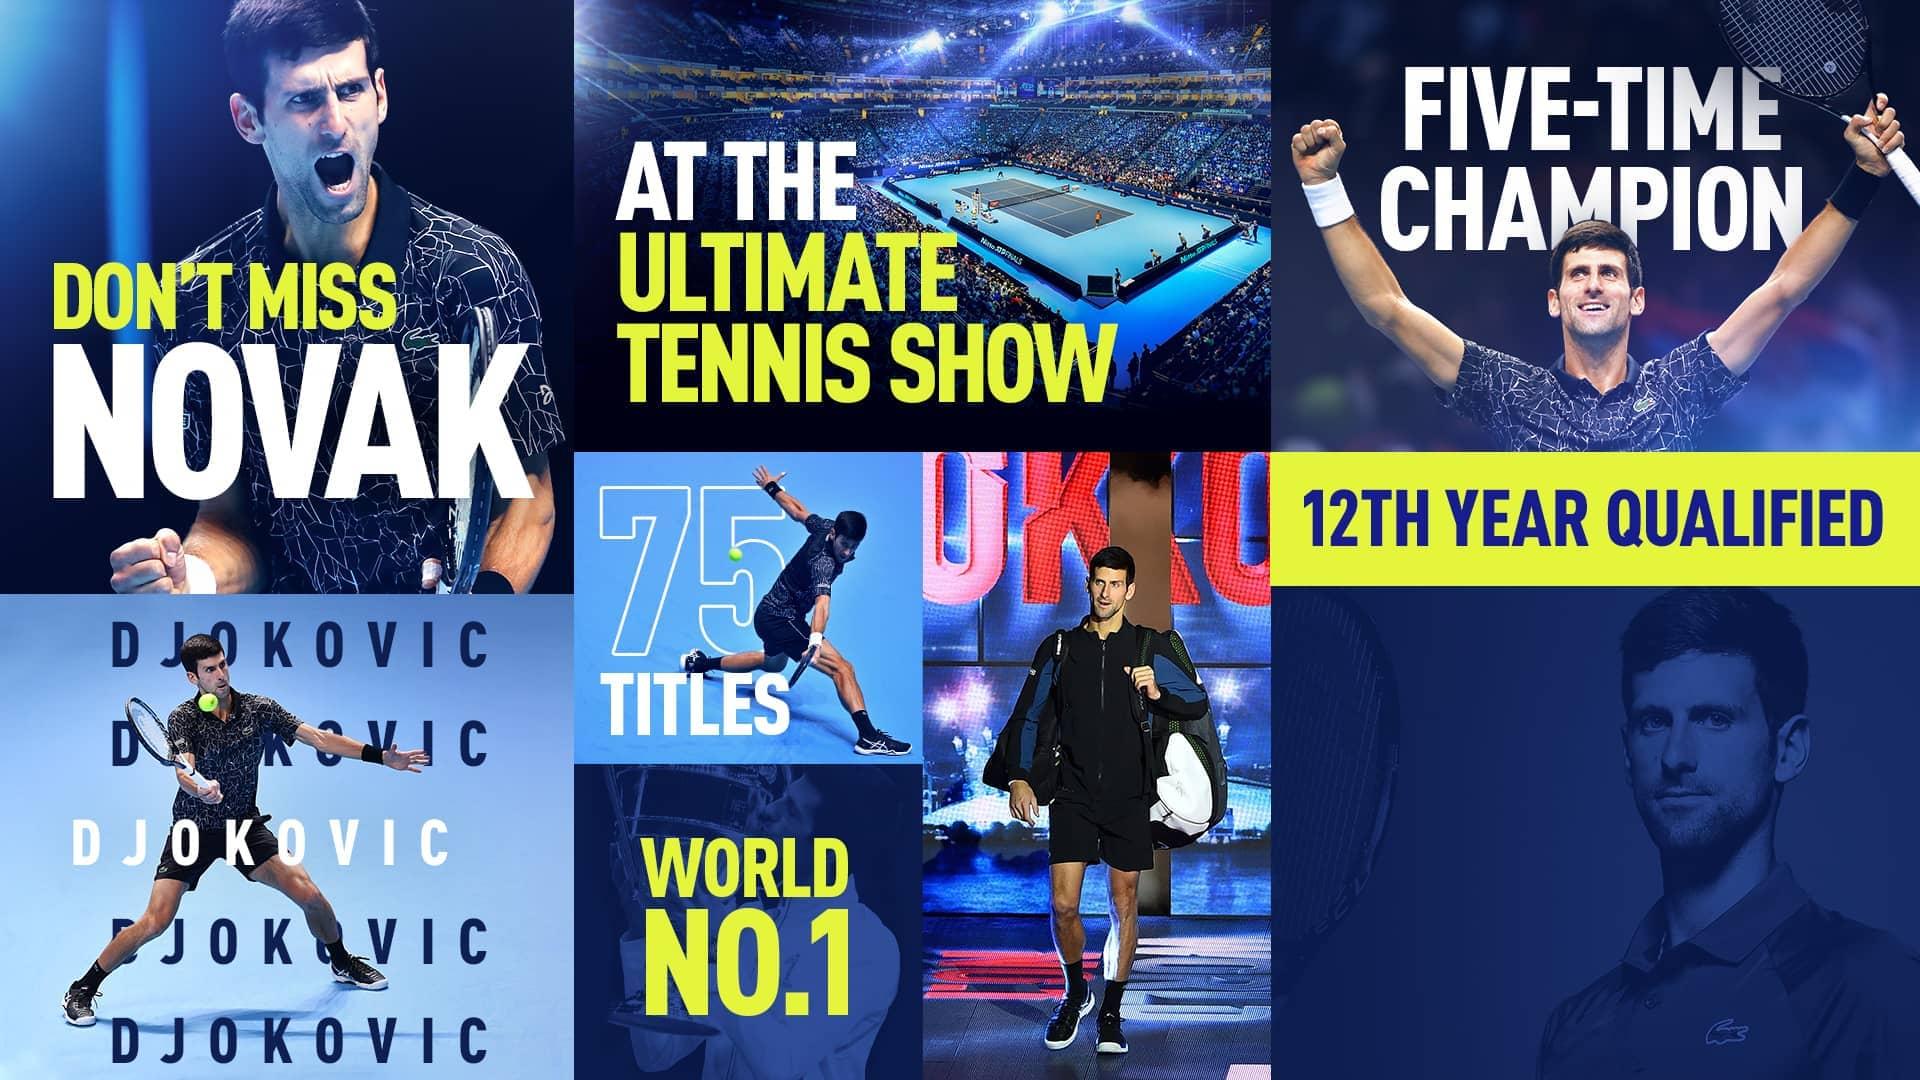 Novak Djokovic Joins Rafael Nadal At 2019 Nitto Atp Finals Atp Tour Tennis